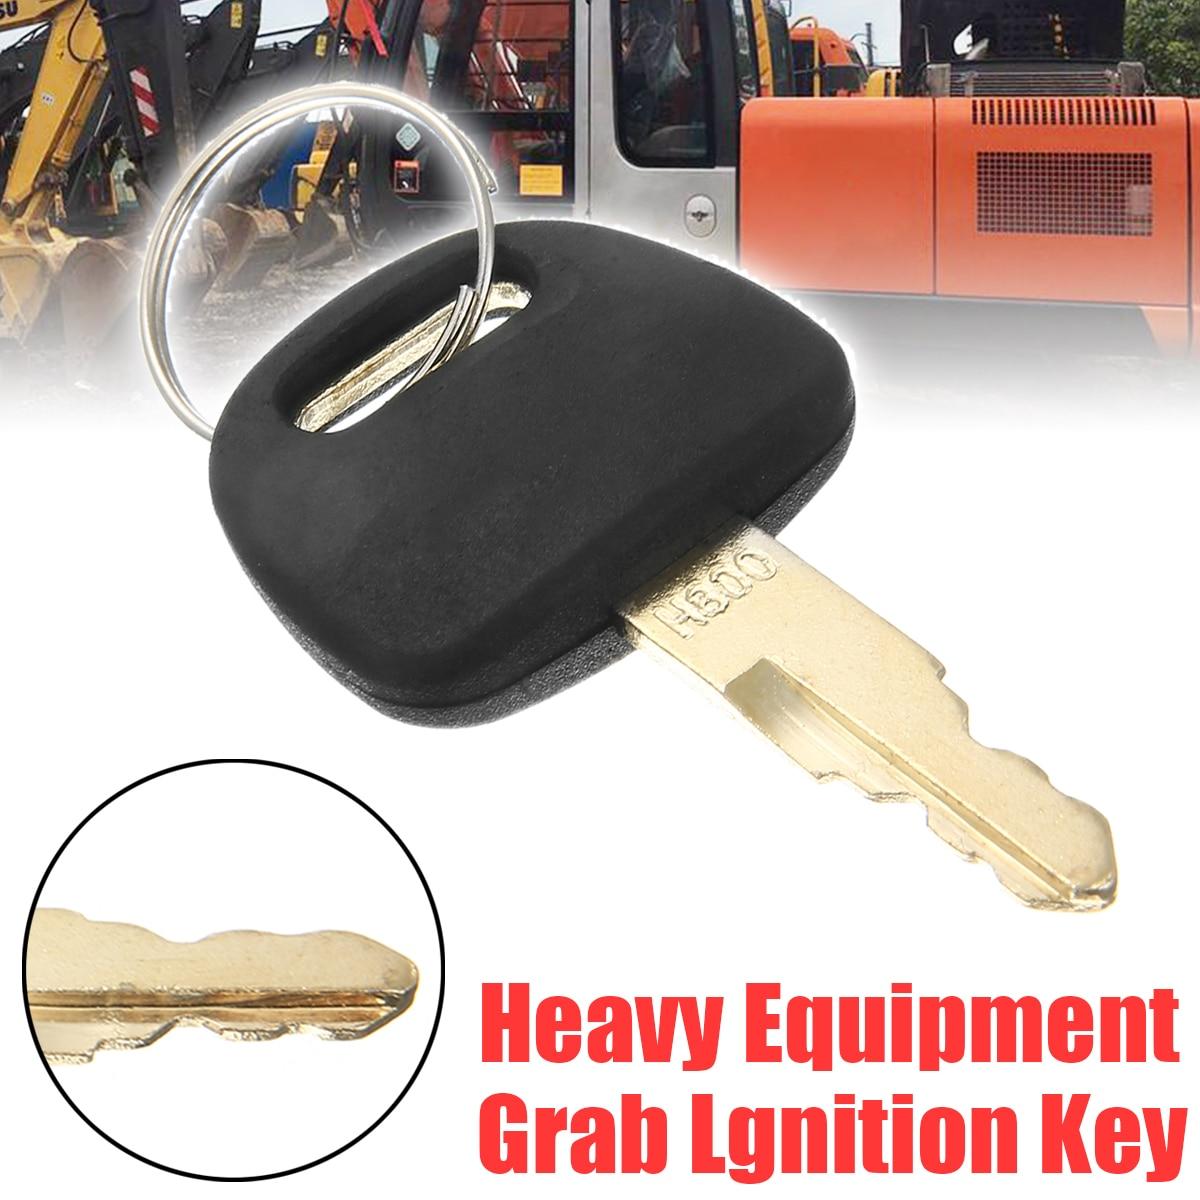 1pc Excavator Accessories Hitachi ZAX Key Durable Newest Heavy Equipment Grab Lgnition Key For Hitachi H800 ZAX Excavator